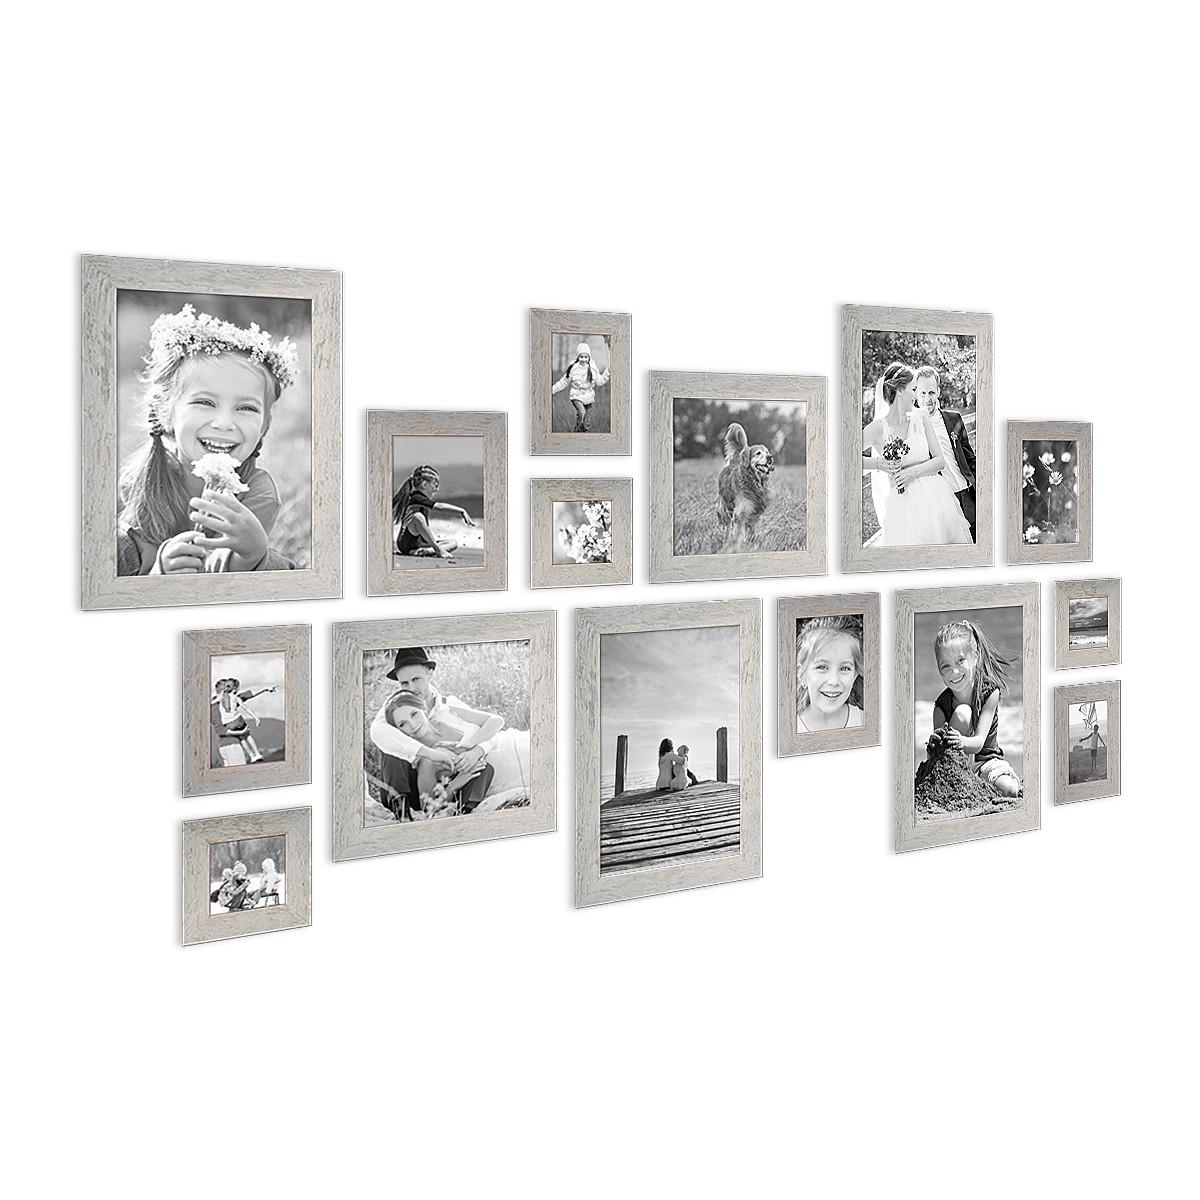 15er Bilderrahmen-Set Strandhaus Grau Rustikal Massivholz 10x15 bis ...